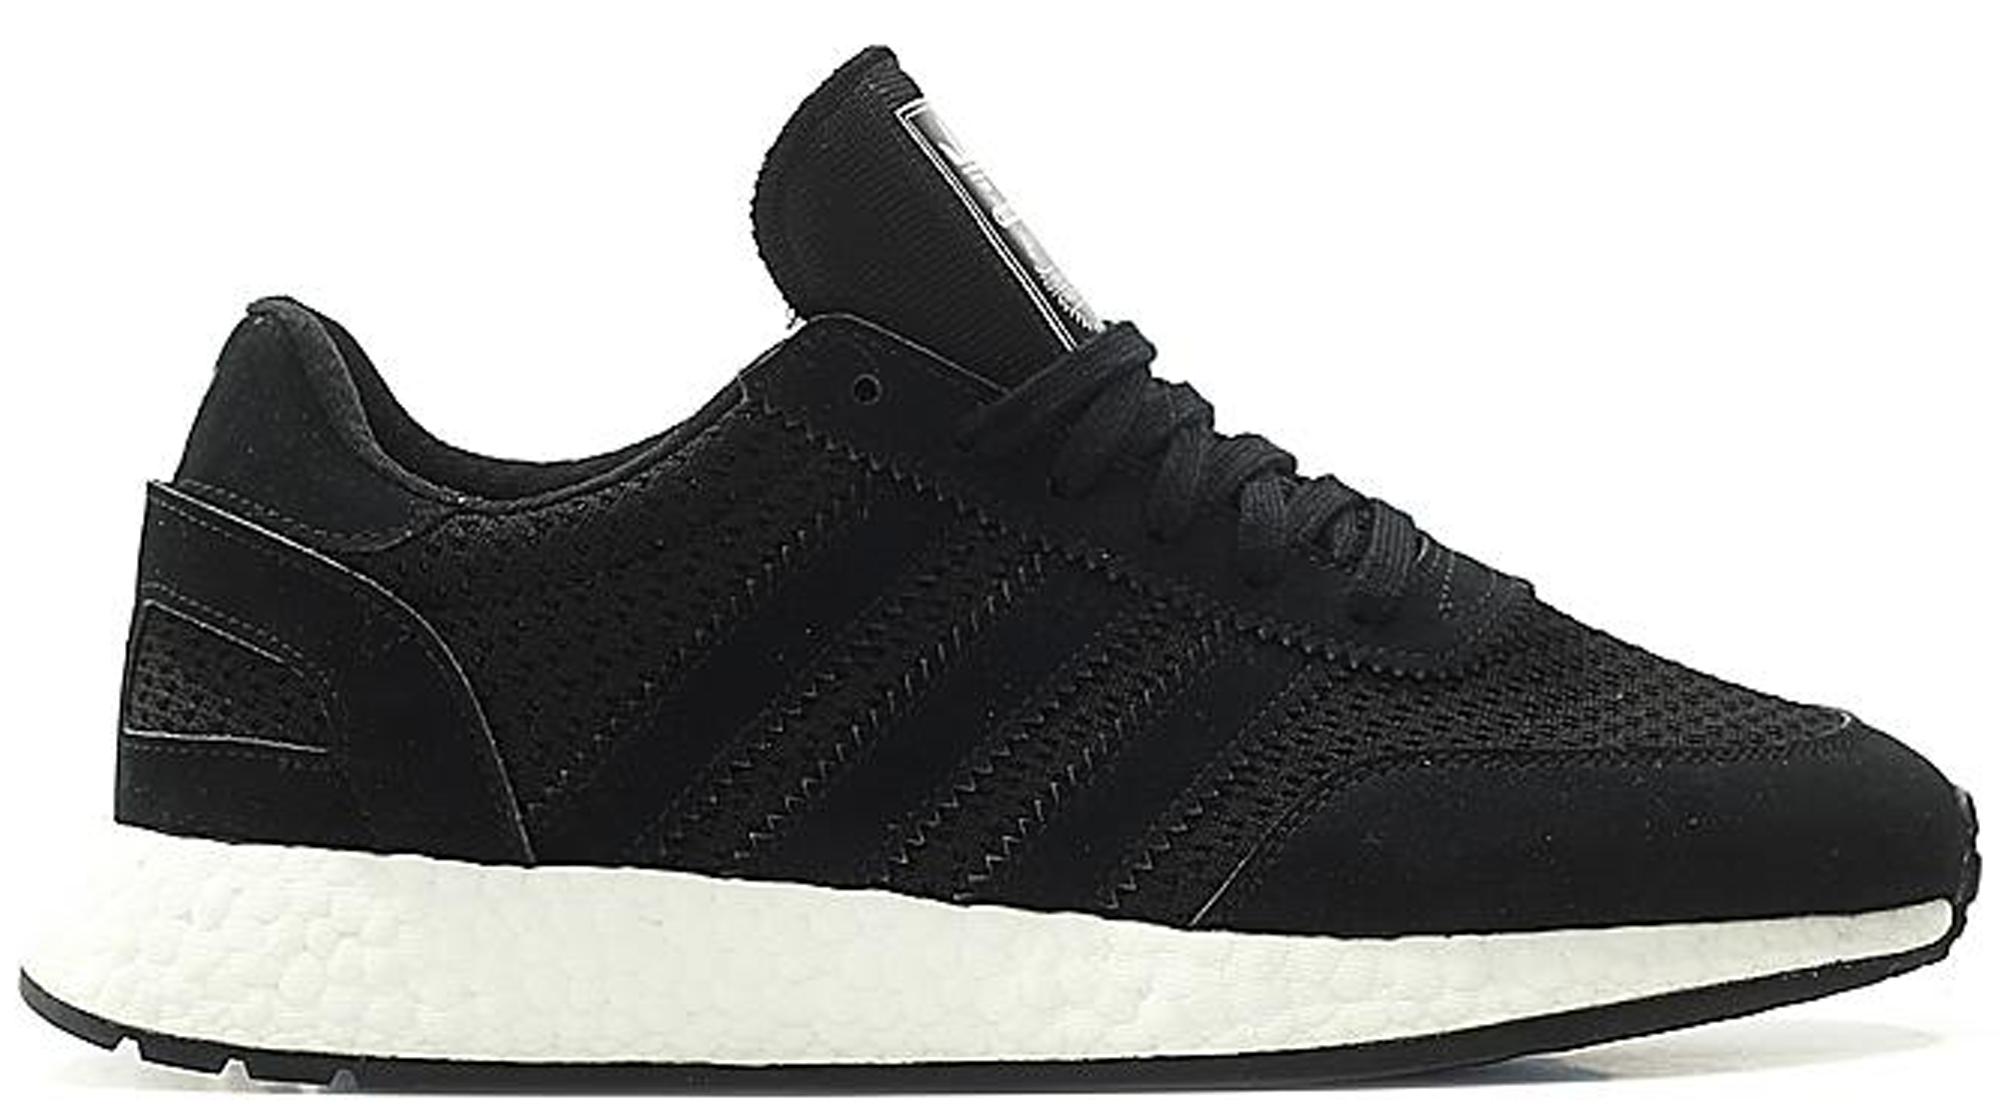 Adidas Iniki Runner Boost All Black BB2090 YouTube